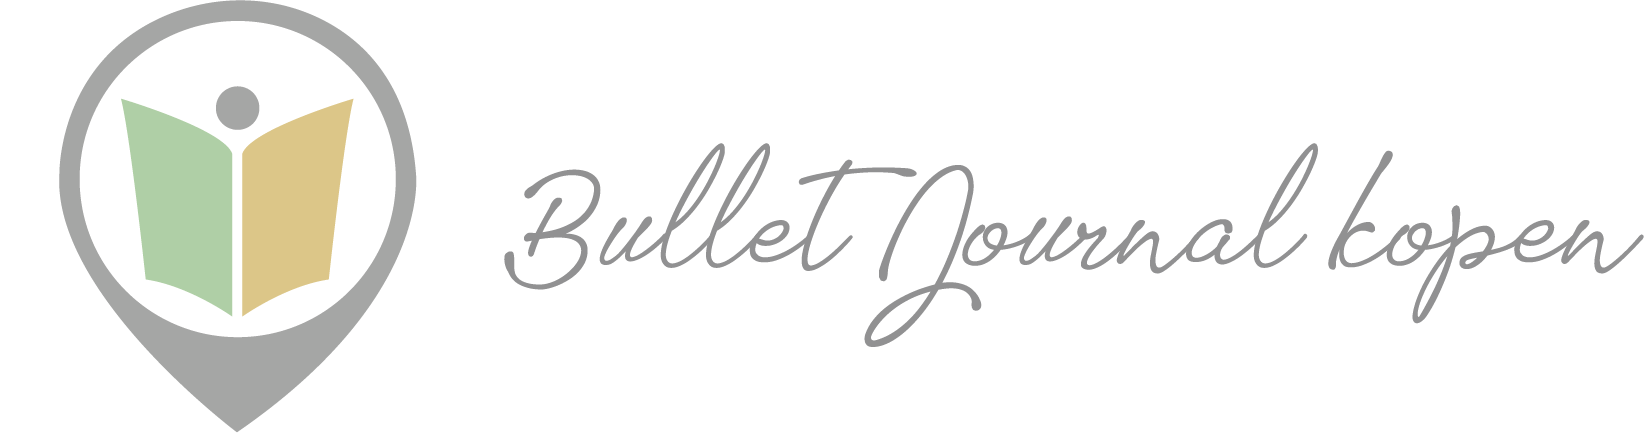 bullet journal webshop